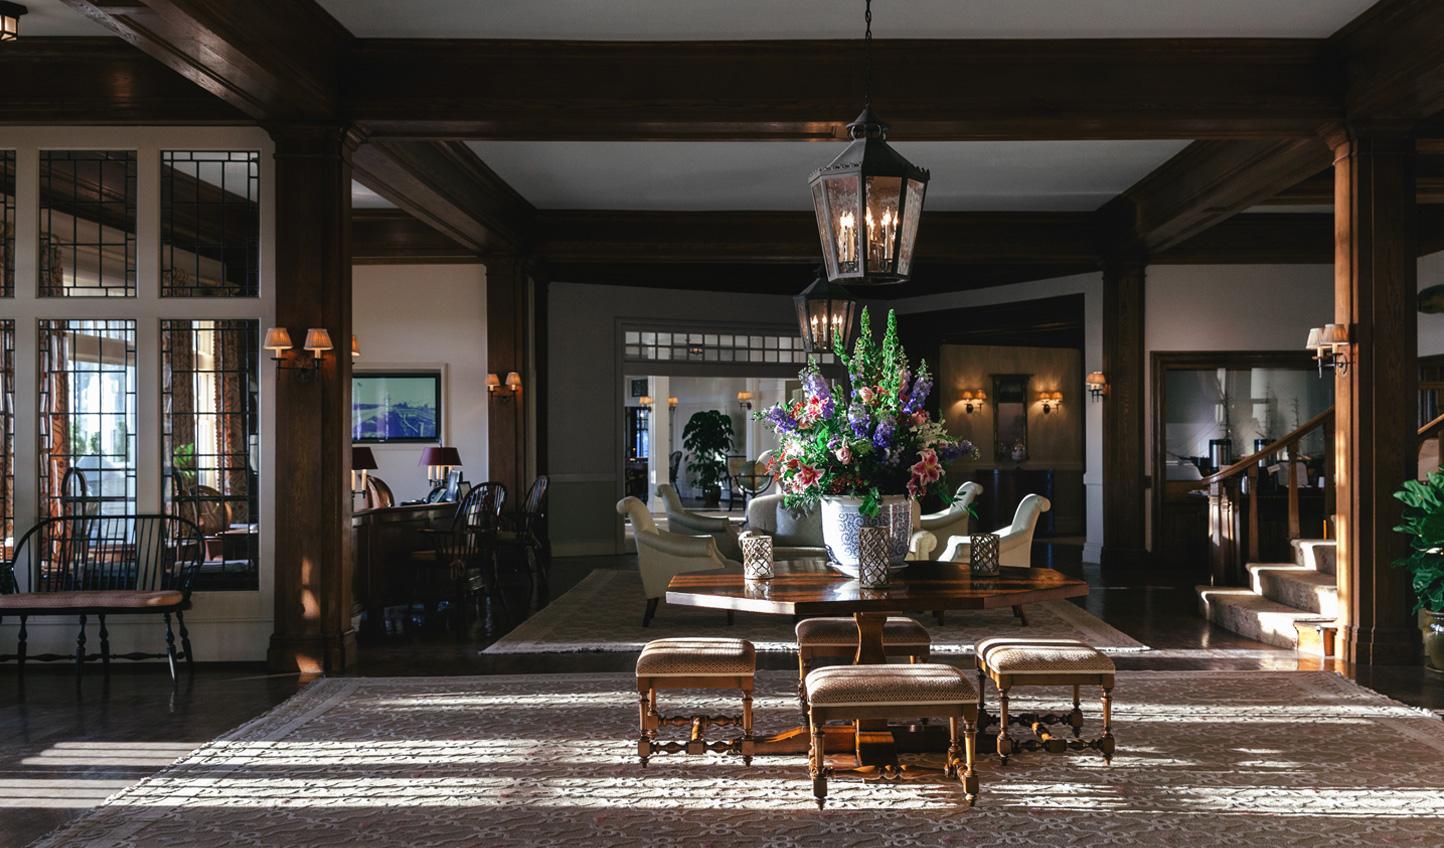 The grandeur of the Chatham Bars Inn never falters